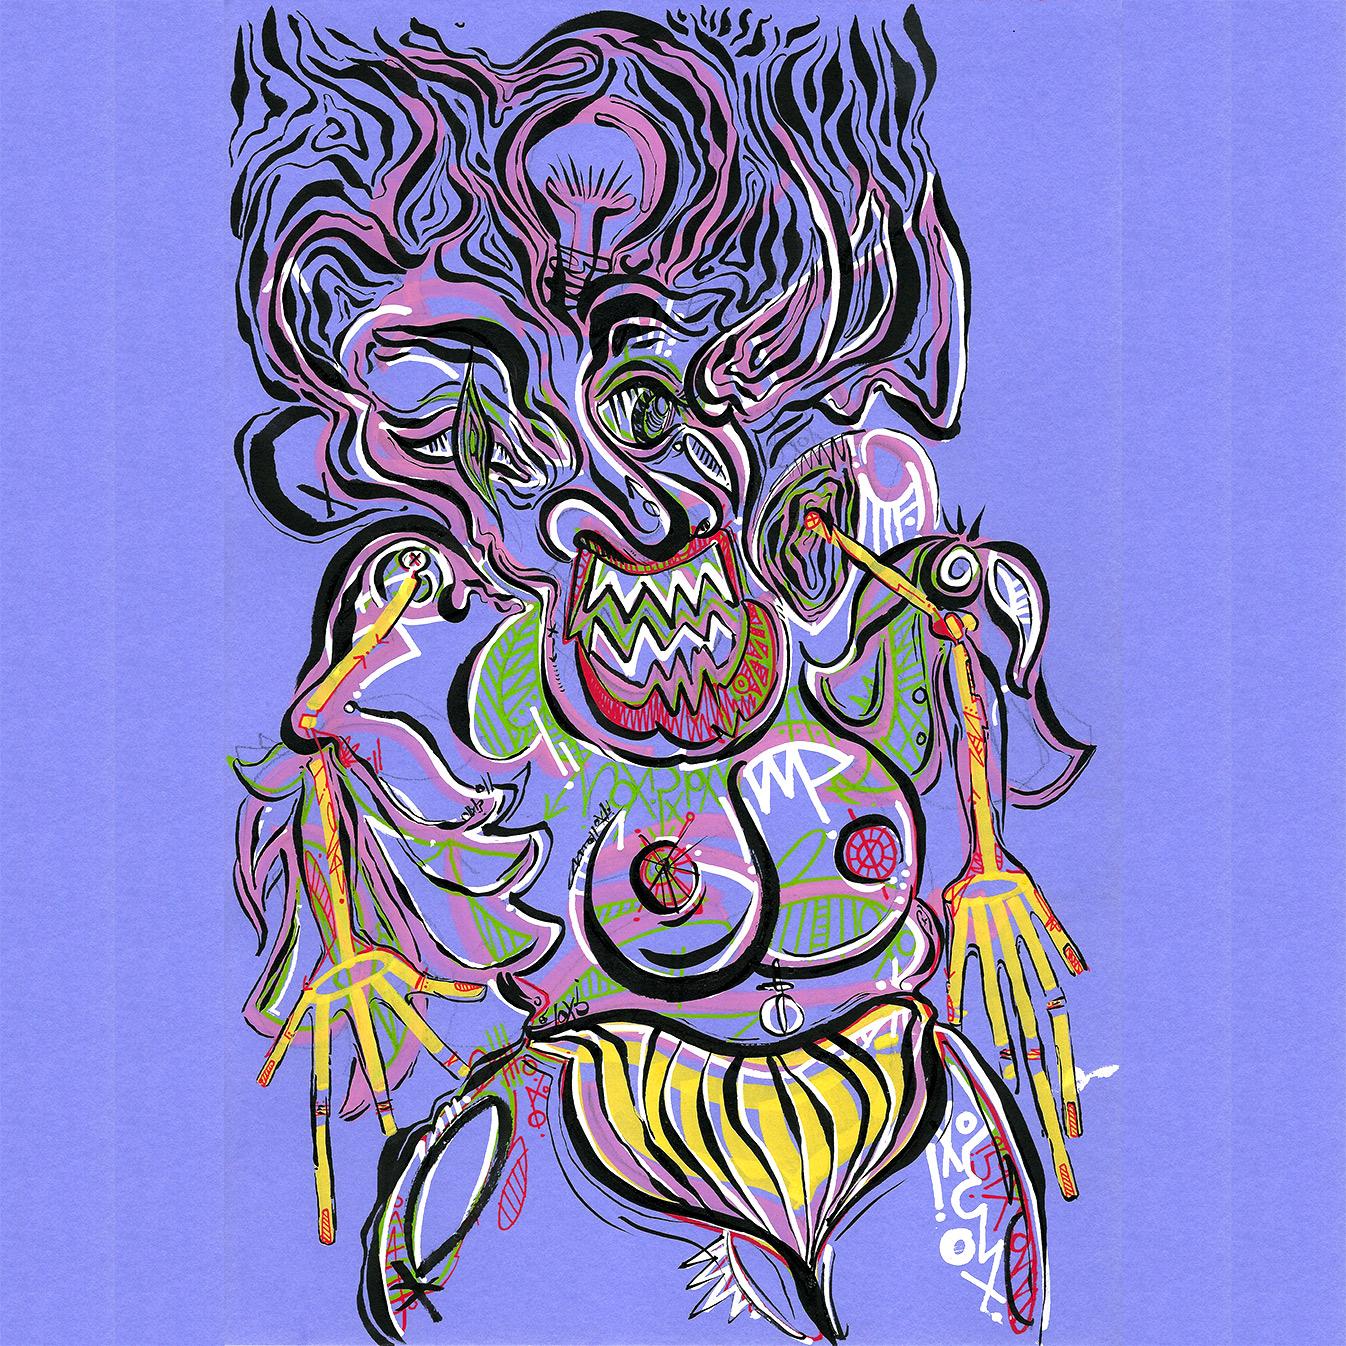 ColourPaper-1.lilac-#web.jpg